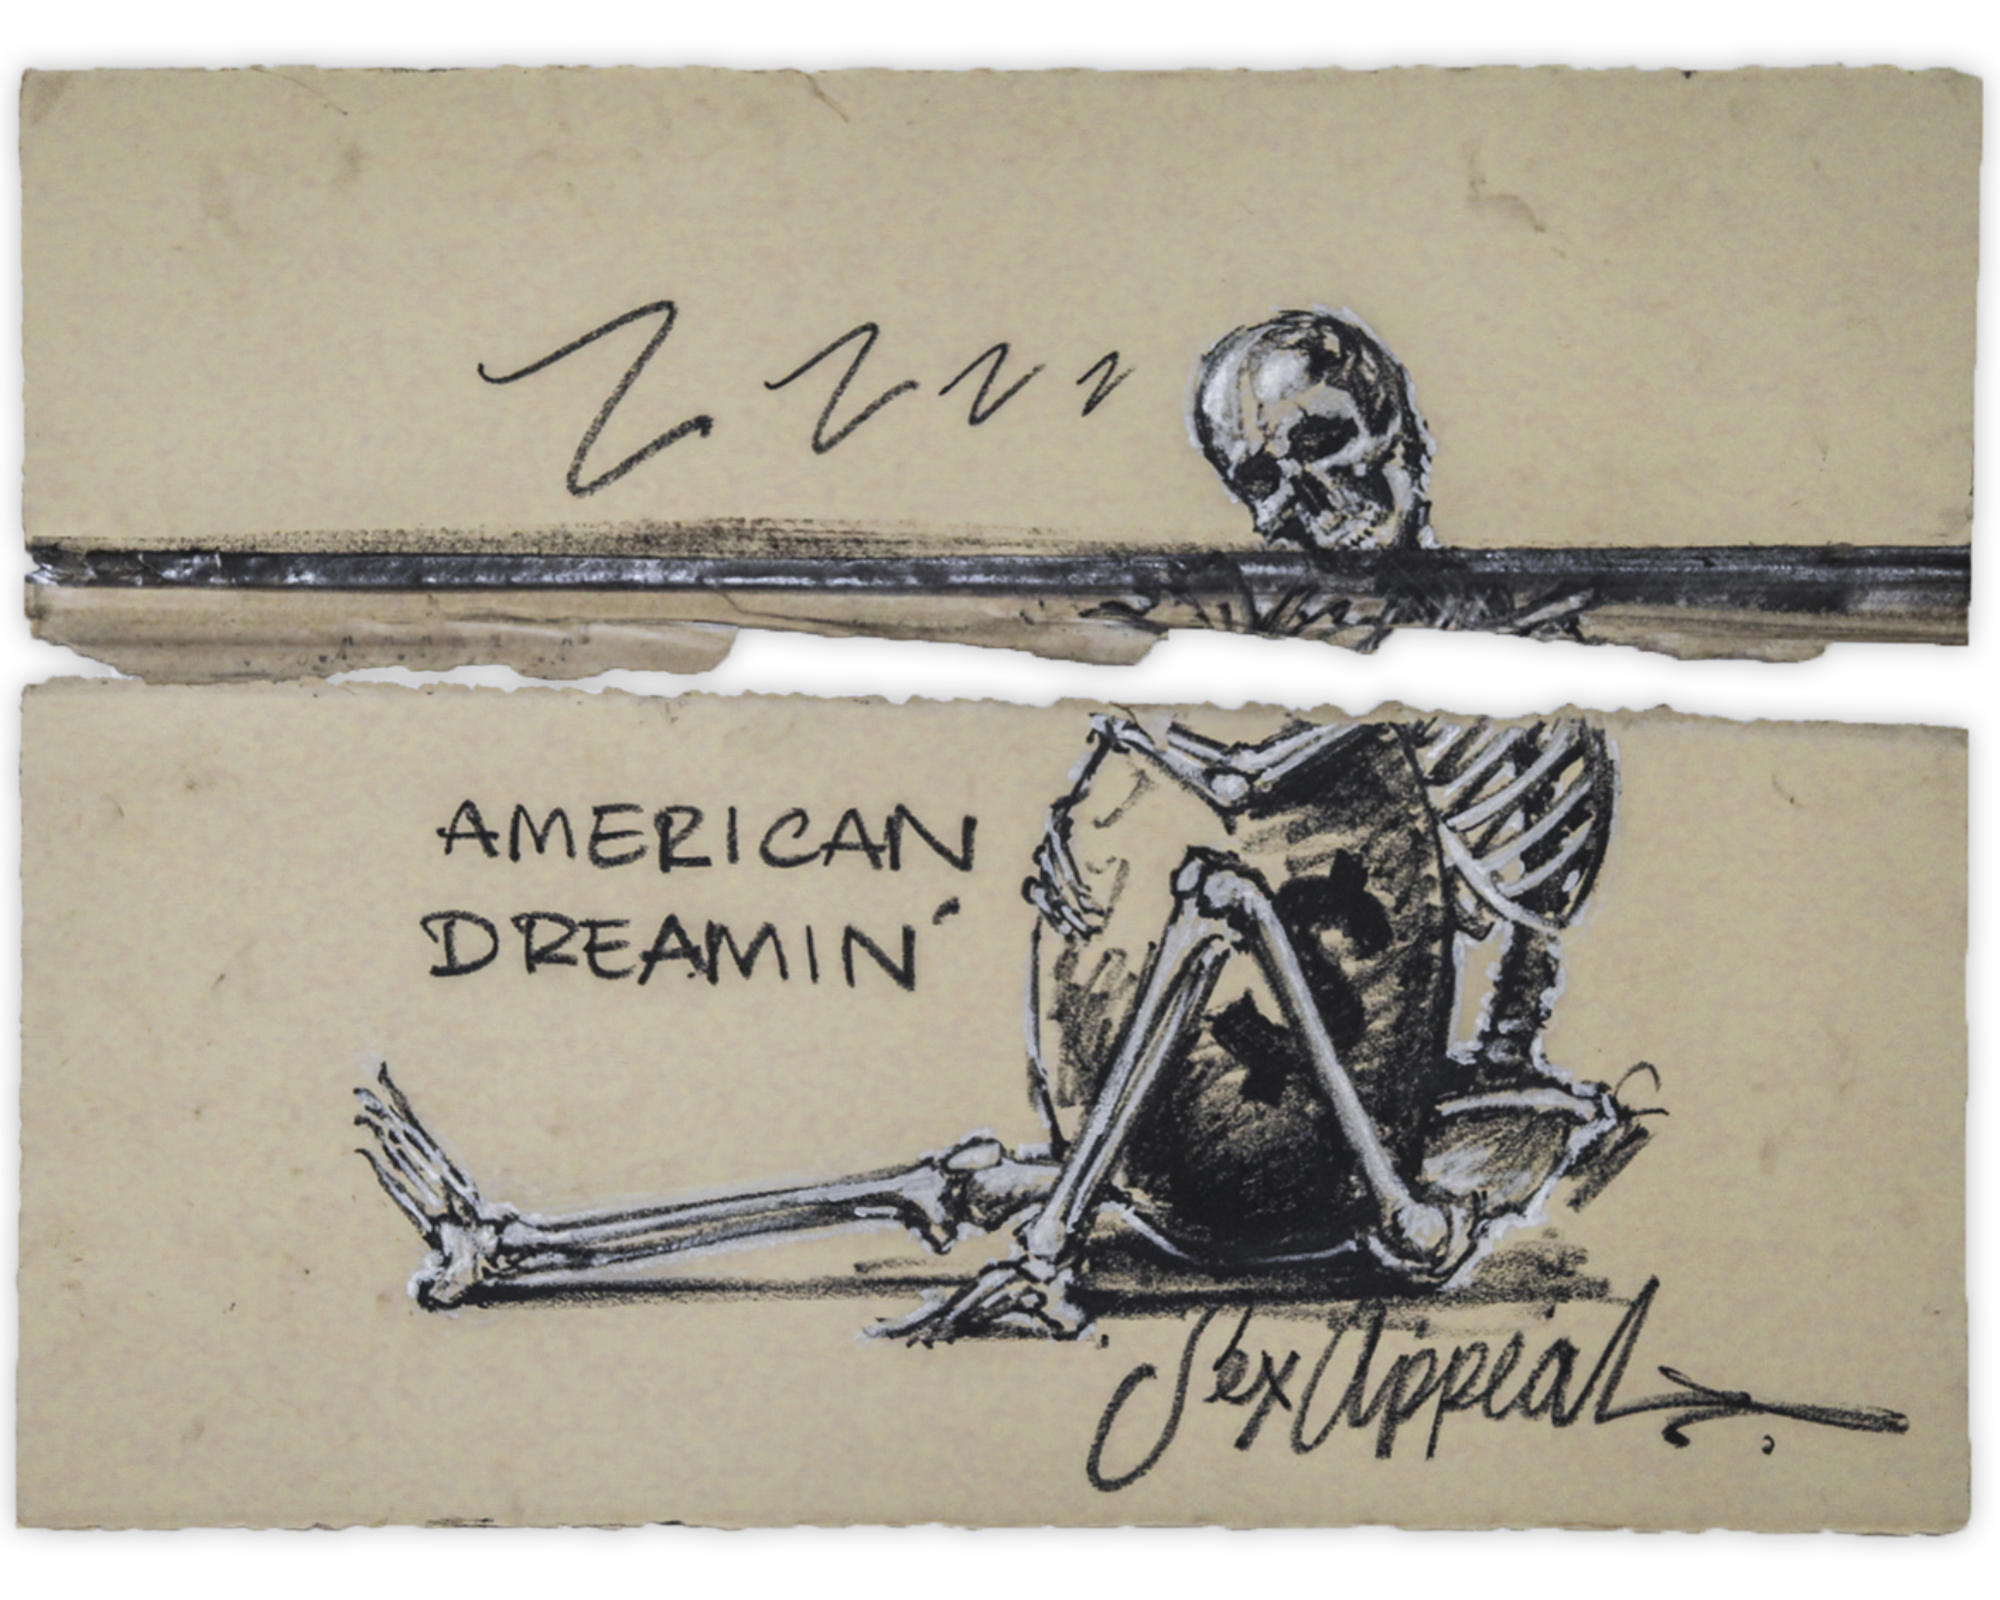 'American Dreamin' '